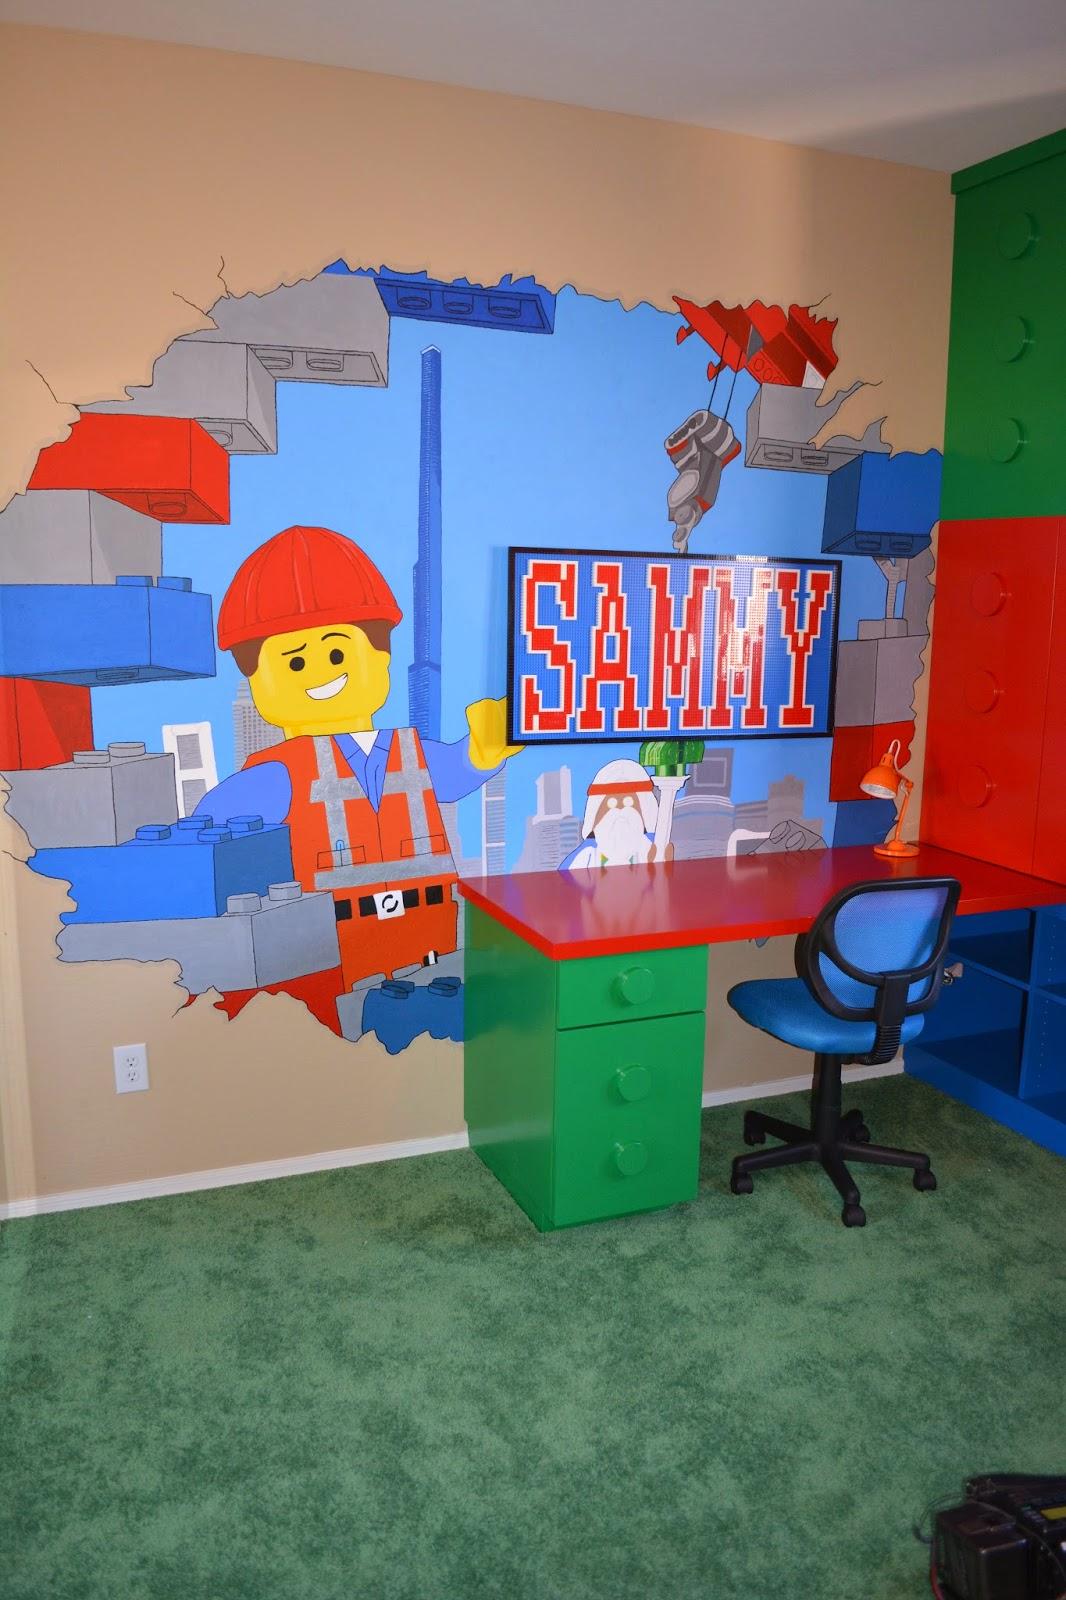 Heidi Schatze May   Lego bedroom. Lego Bedroom  Lunararc Sims Lego Bedroom Set  40 Best LEGO Room